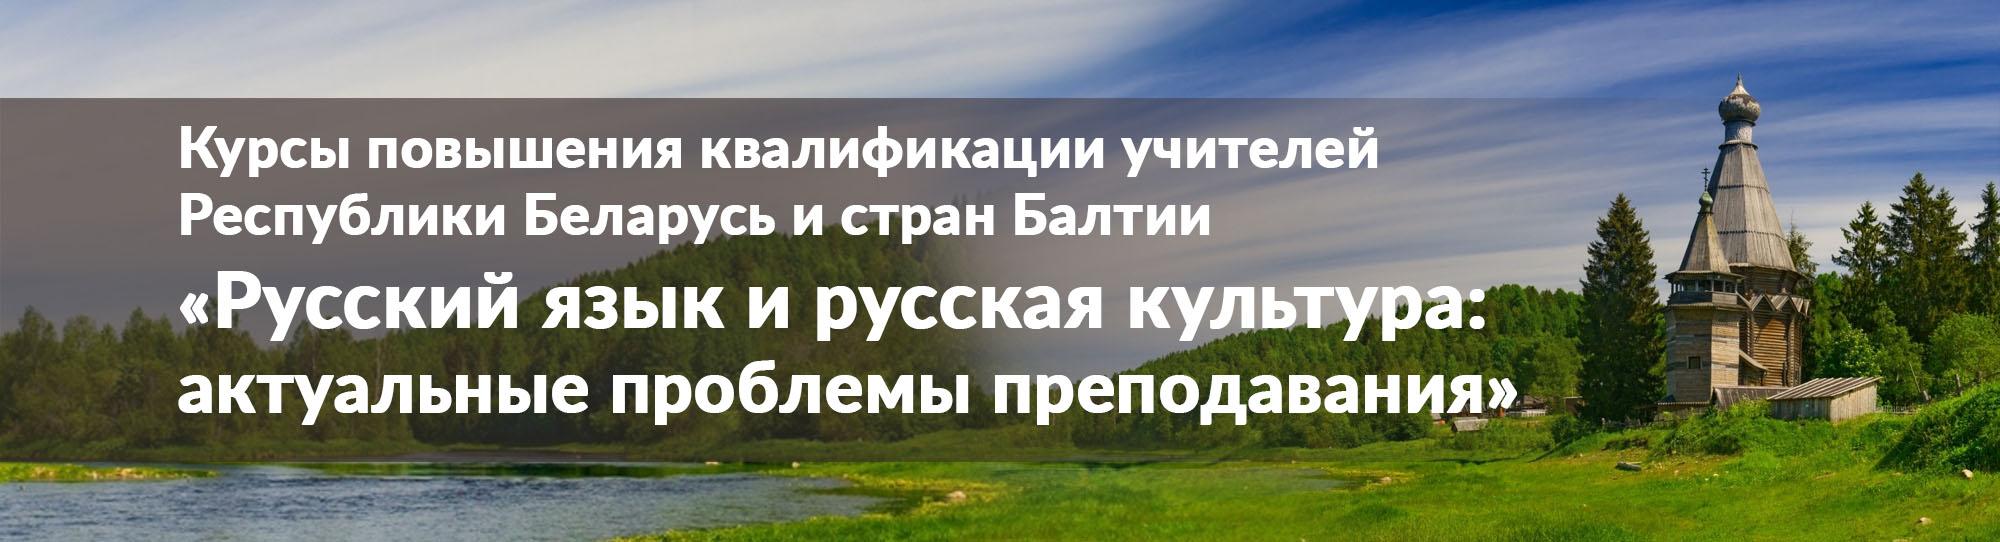 banner-belarus-strany-baltii